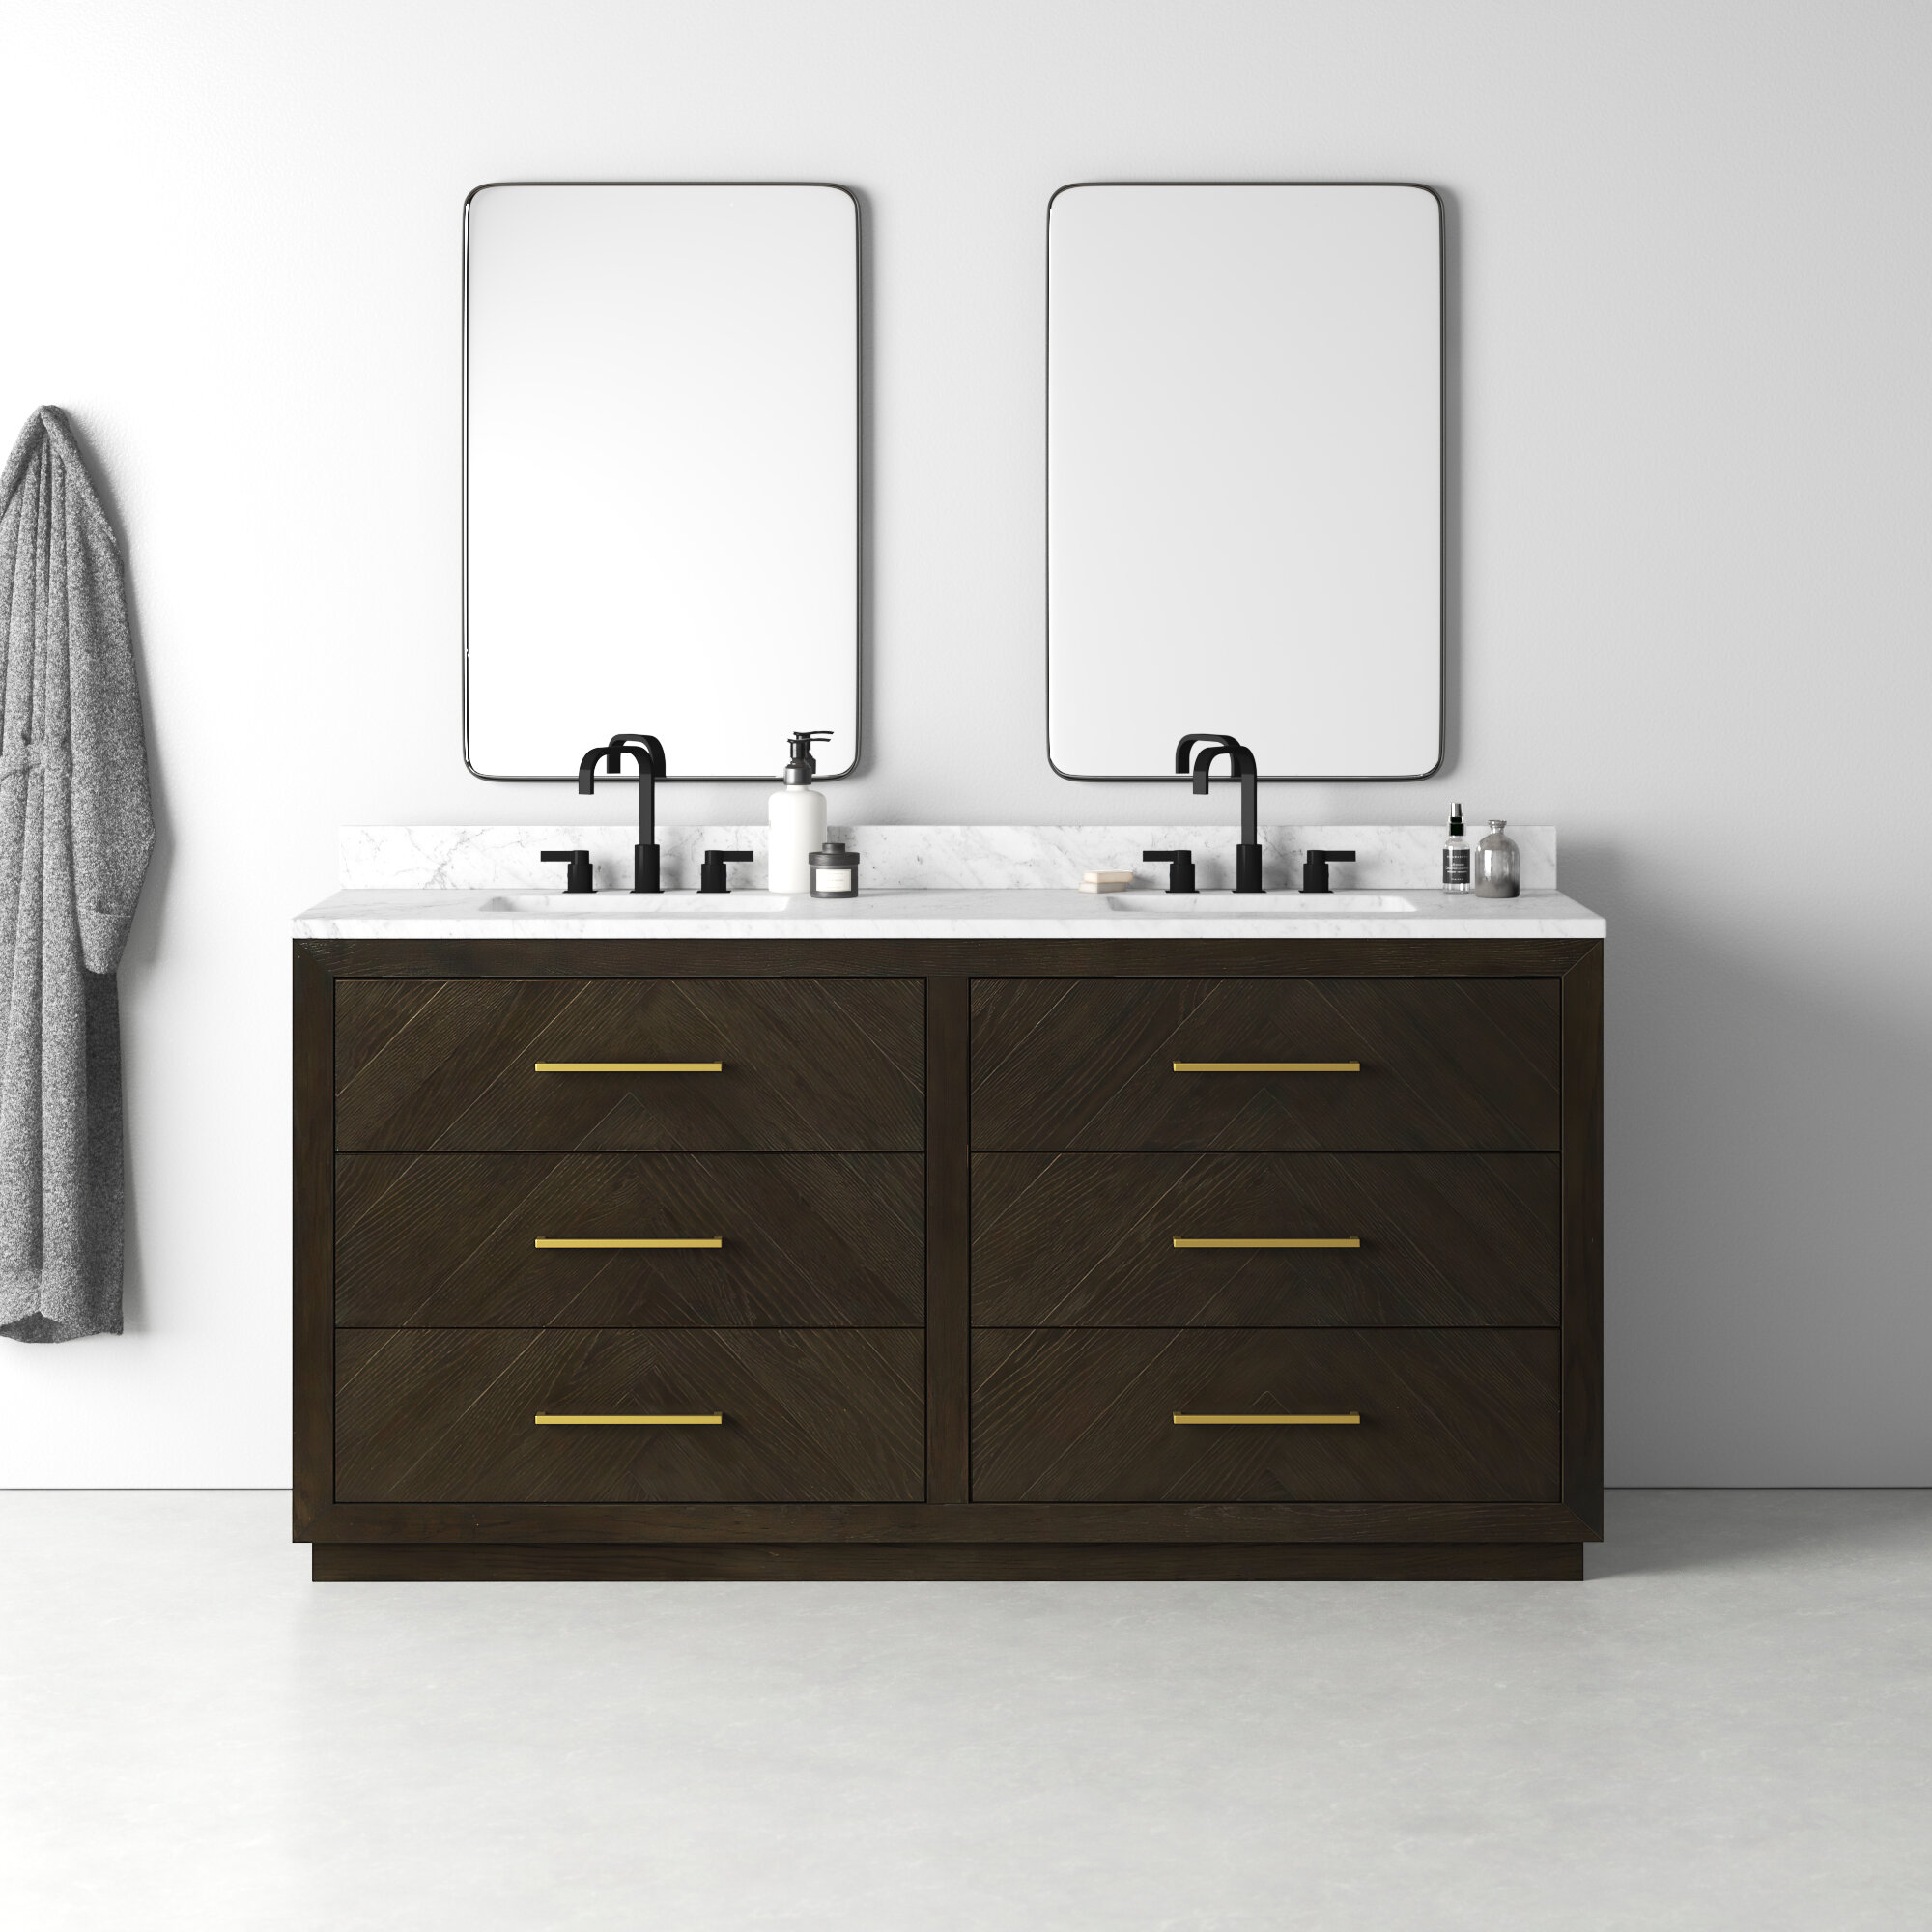 Lanny 72 Double Bathroom Vanity Set Reviews Allmodern